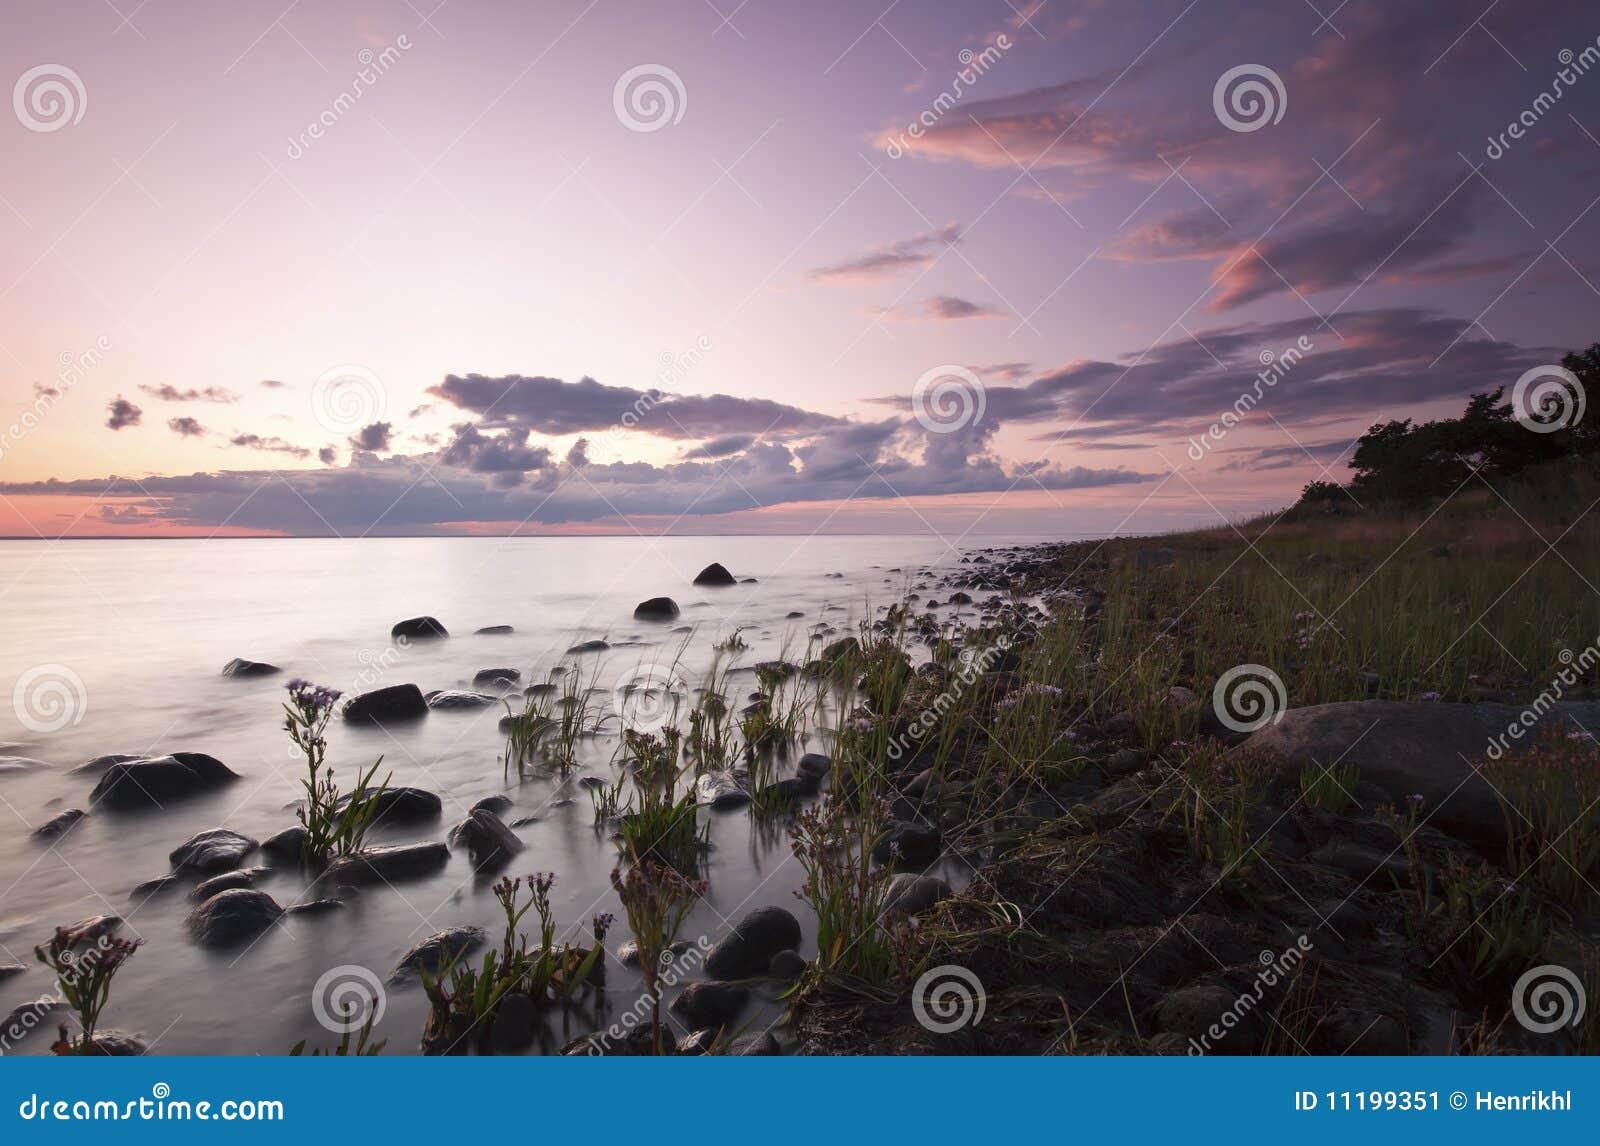 Evening ocean scene.